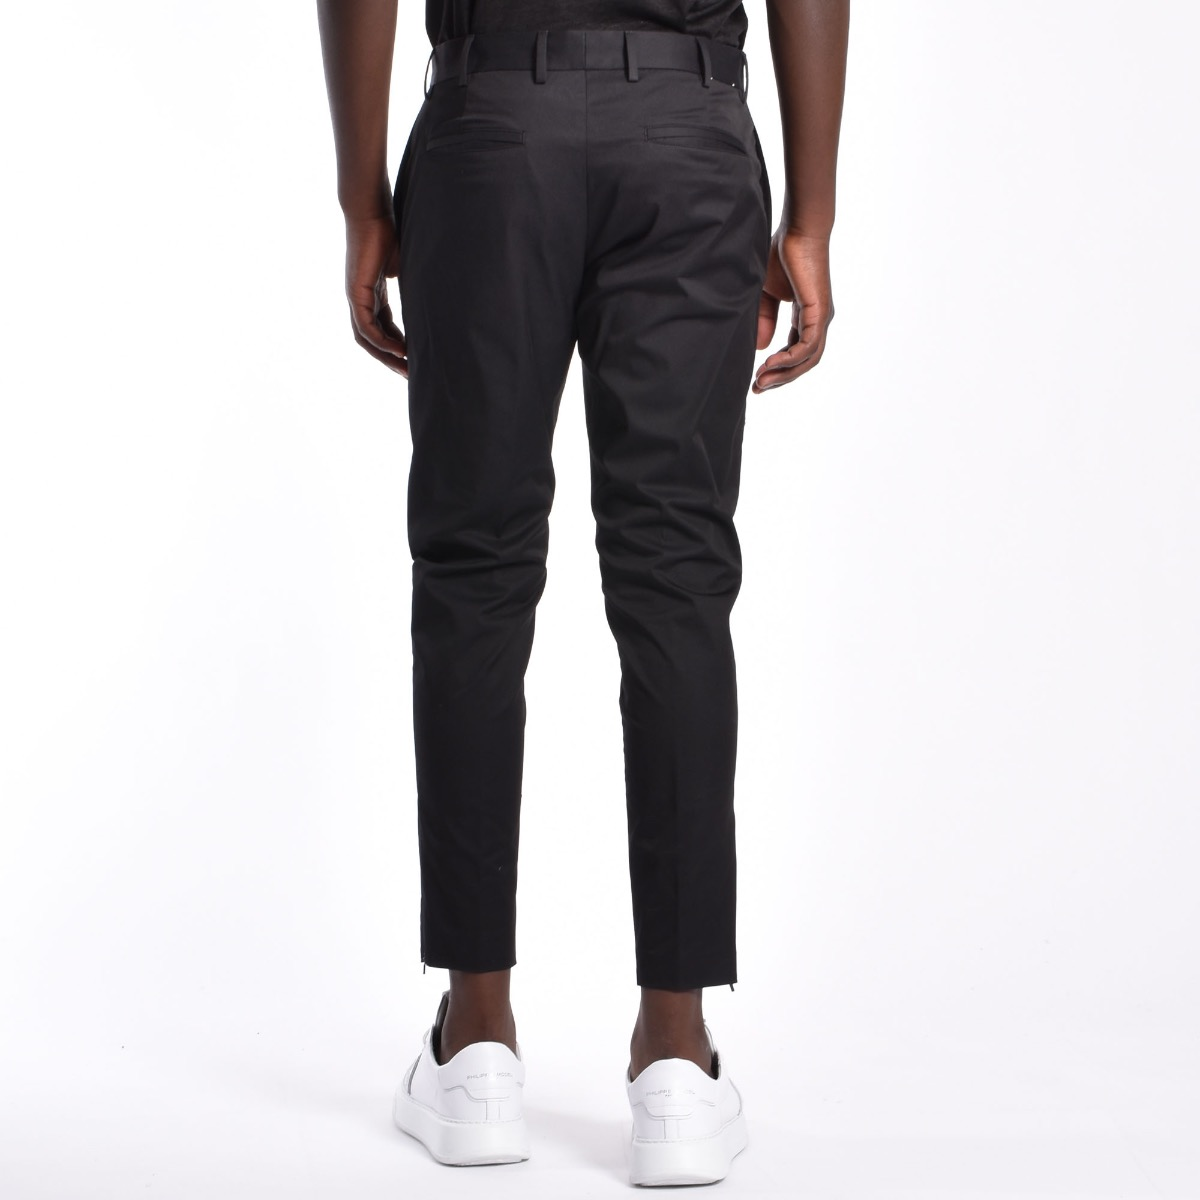 Pantalone zip laterale orlo - Nero